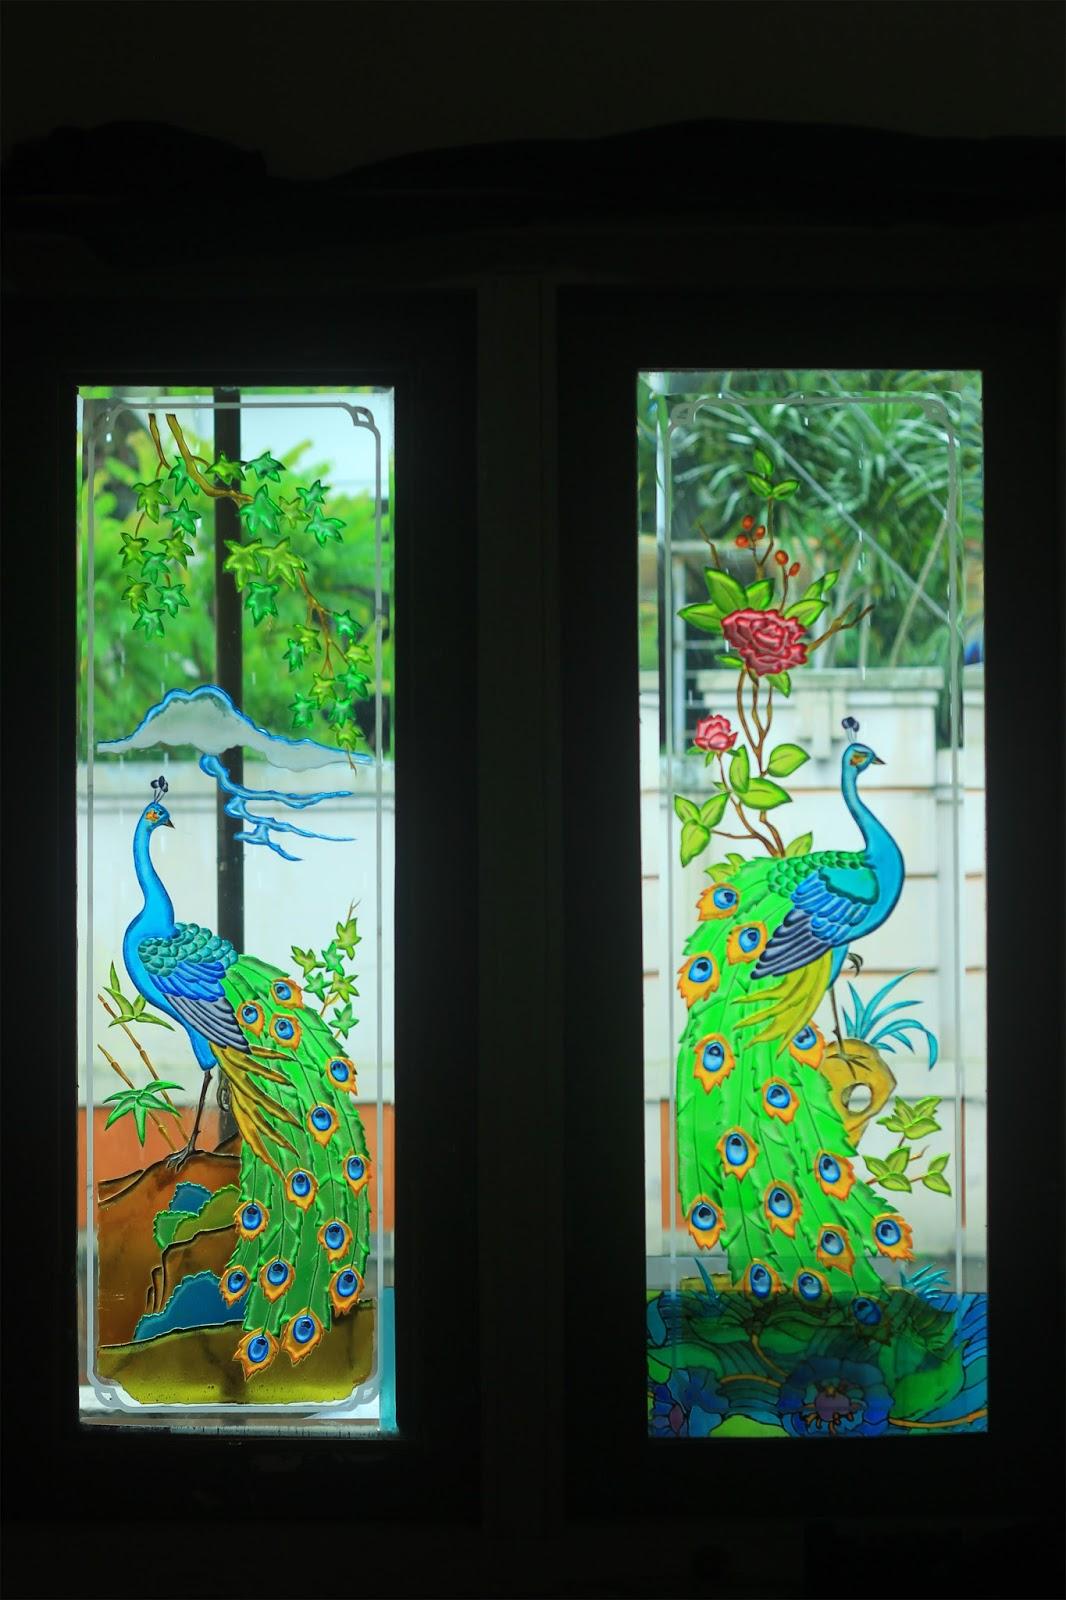 Ide Top 47 Gambar Jendela Kaca Lukis Kaca lukis untuk jendela